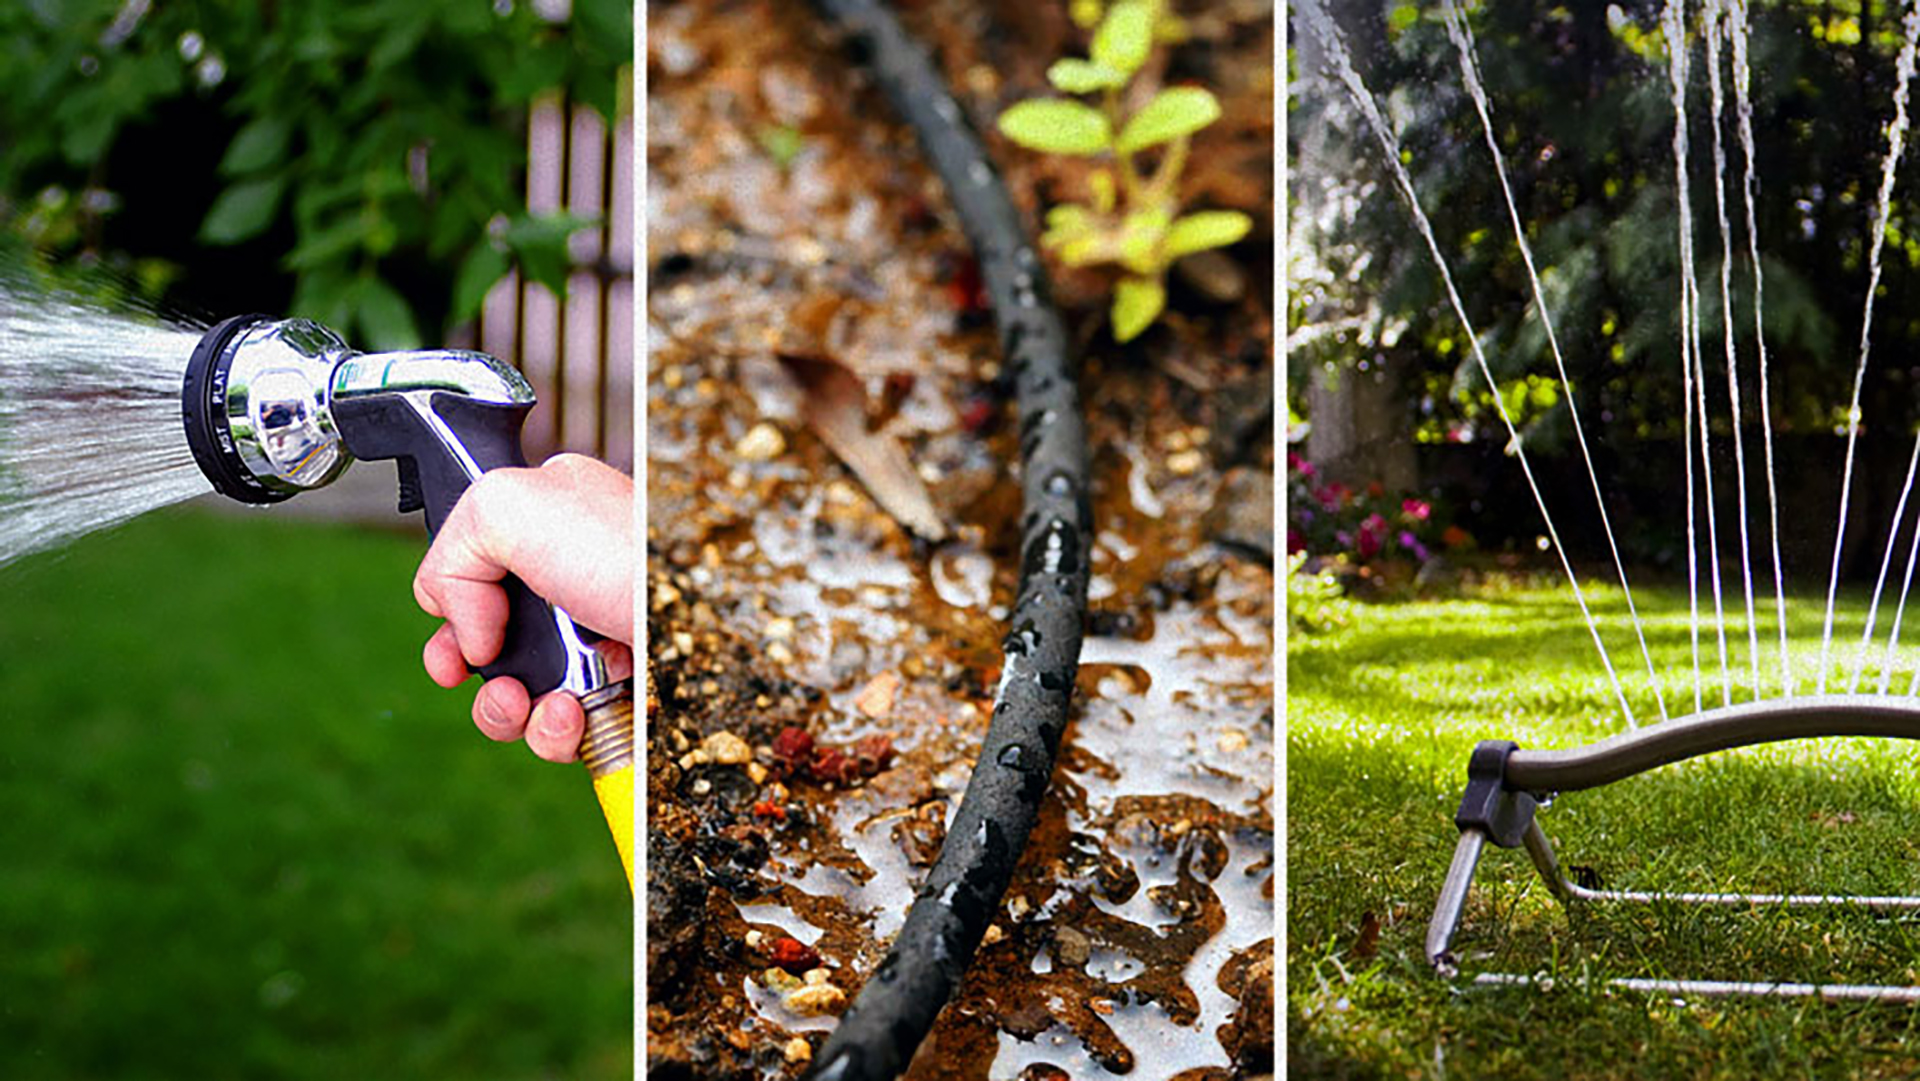 priority_designs_lawn_garden_design_engineering_development_prototyping_010